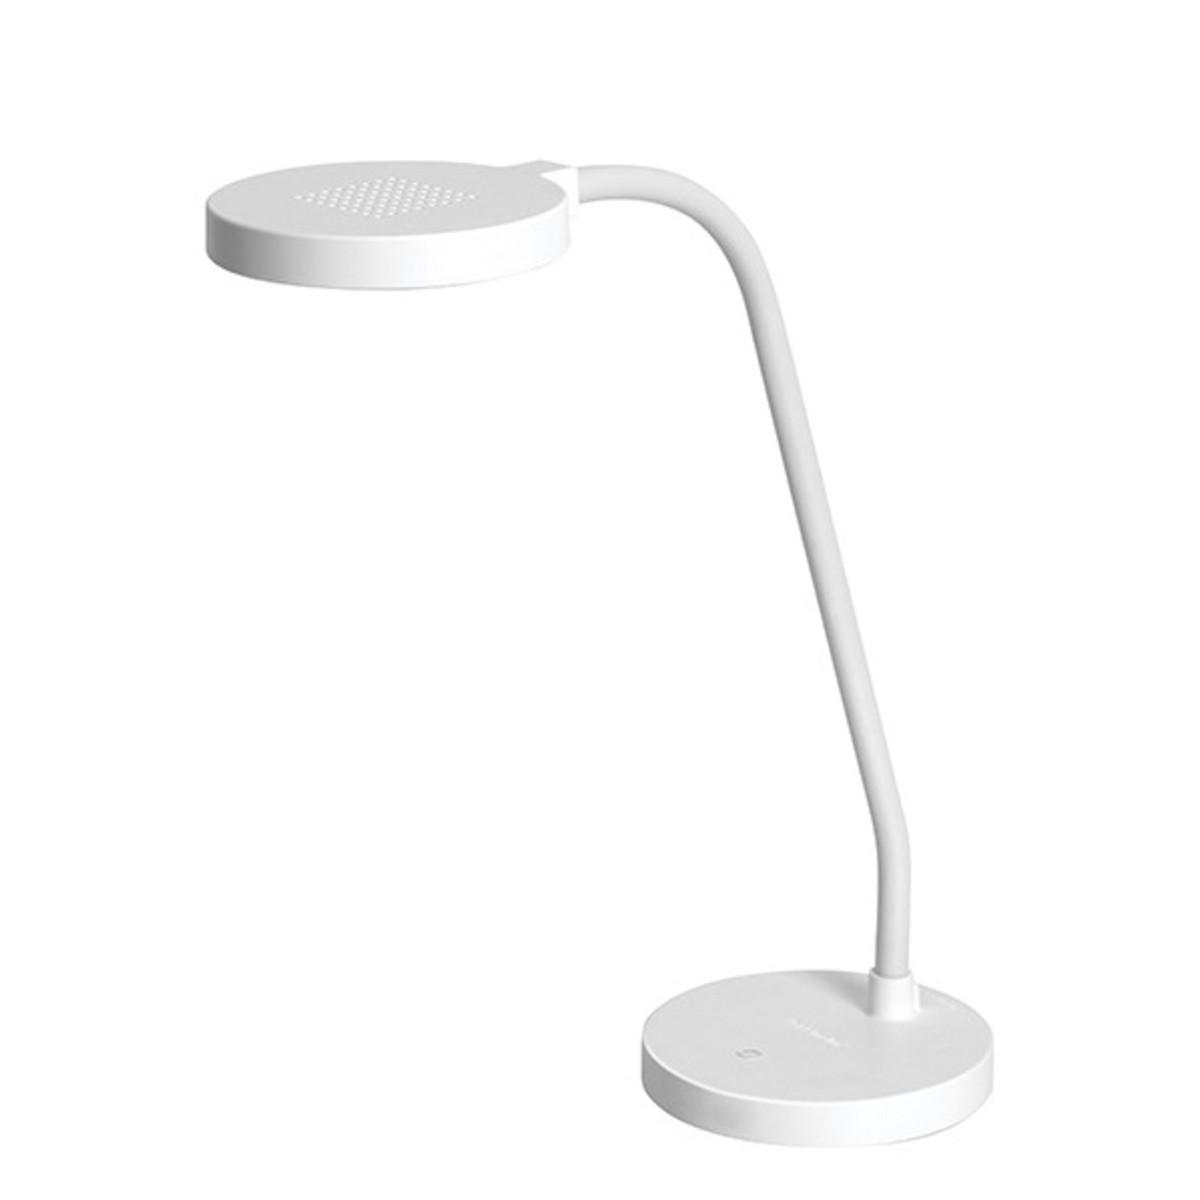 博視燈 Air 3 - 白色【香港行貨】